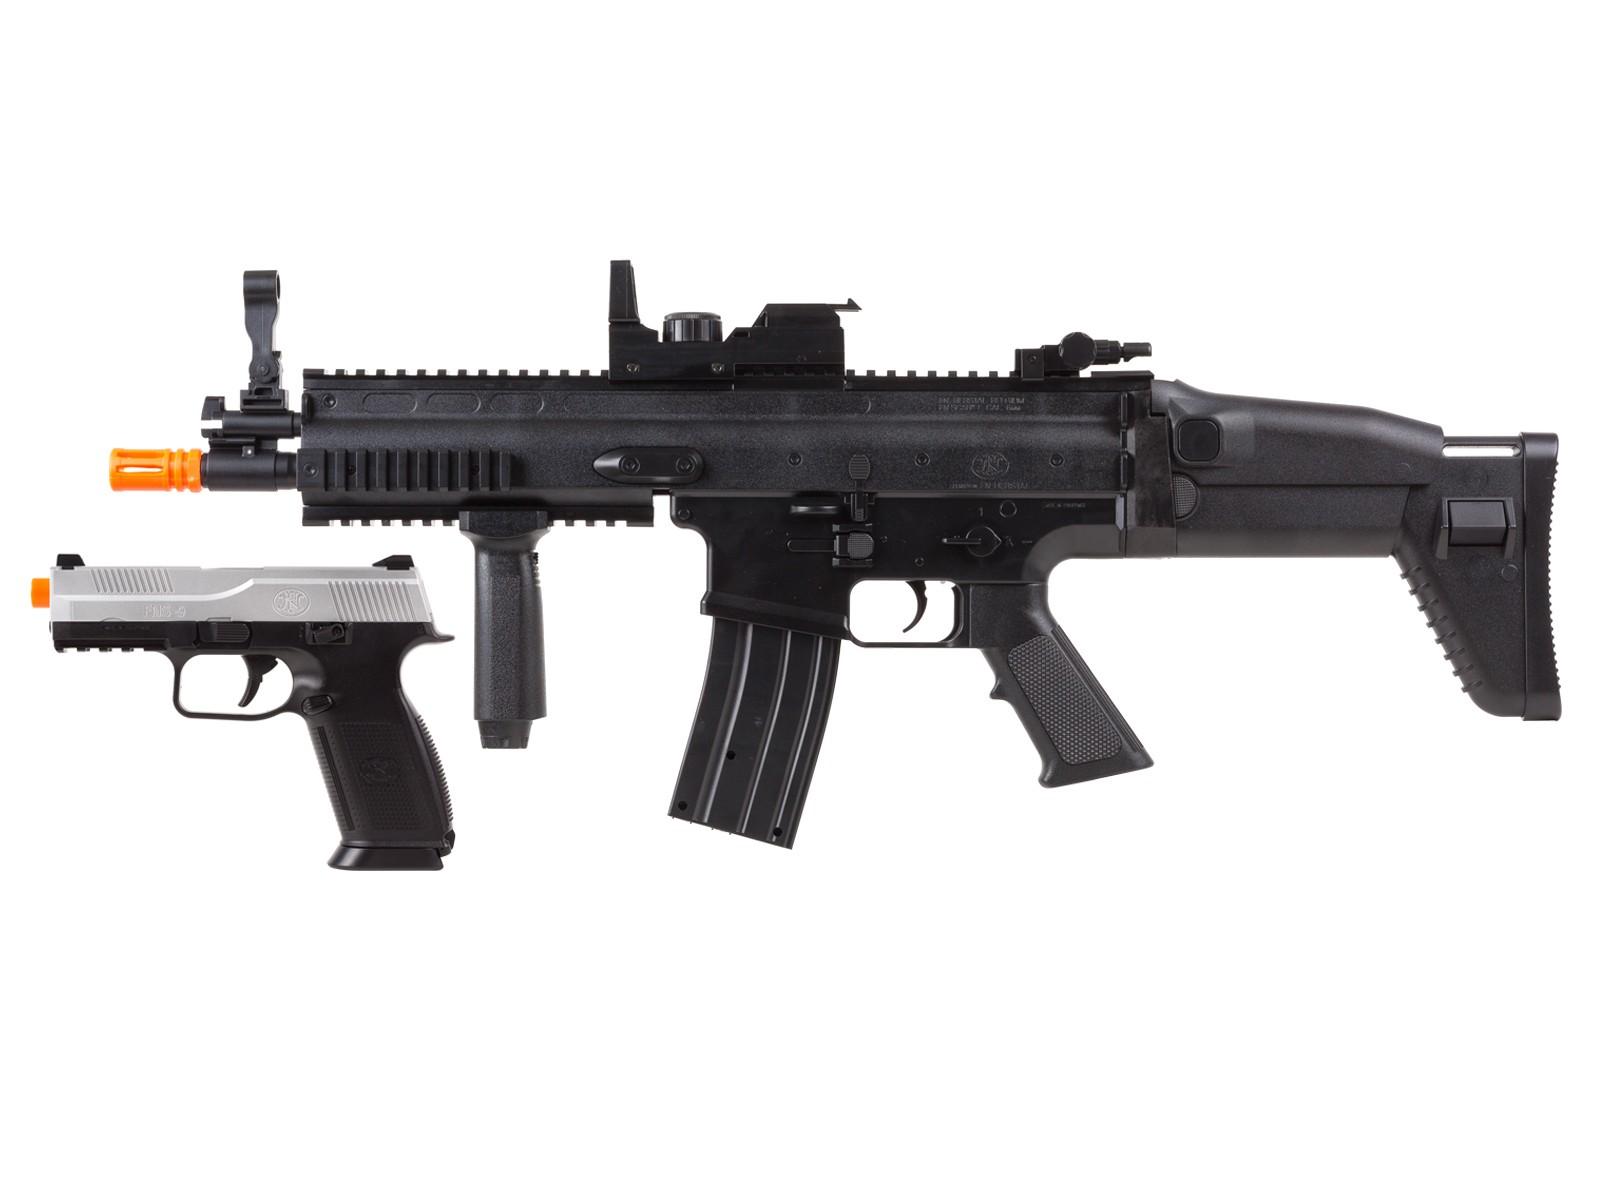 Bucks Auto Sales >> FN Herstal Scar-L AEG & FNS-9 Spring Pistol Kit. Airsoft gun